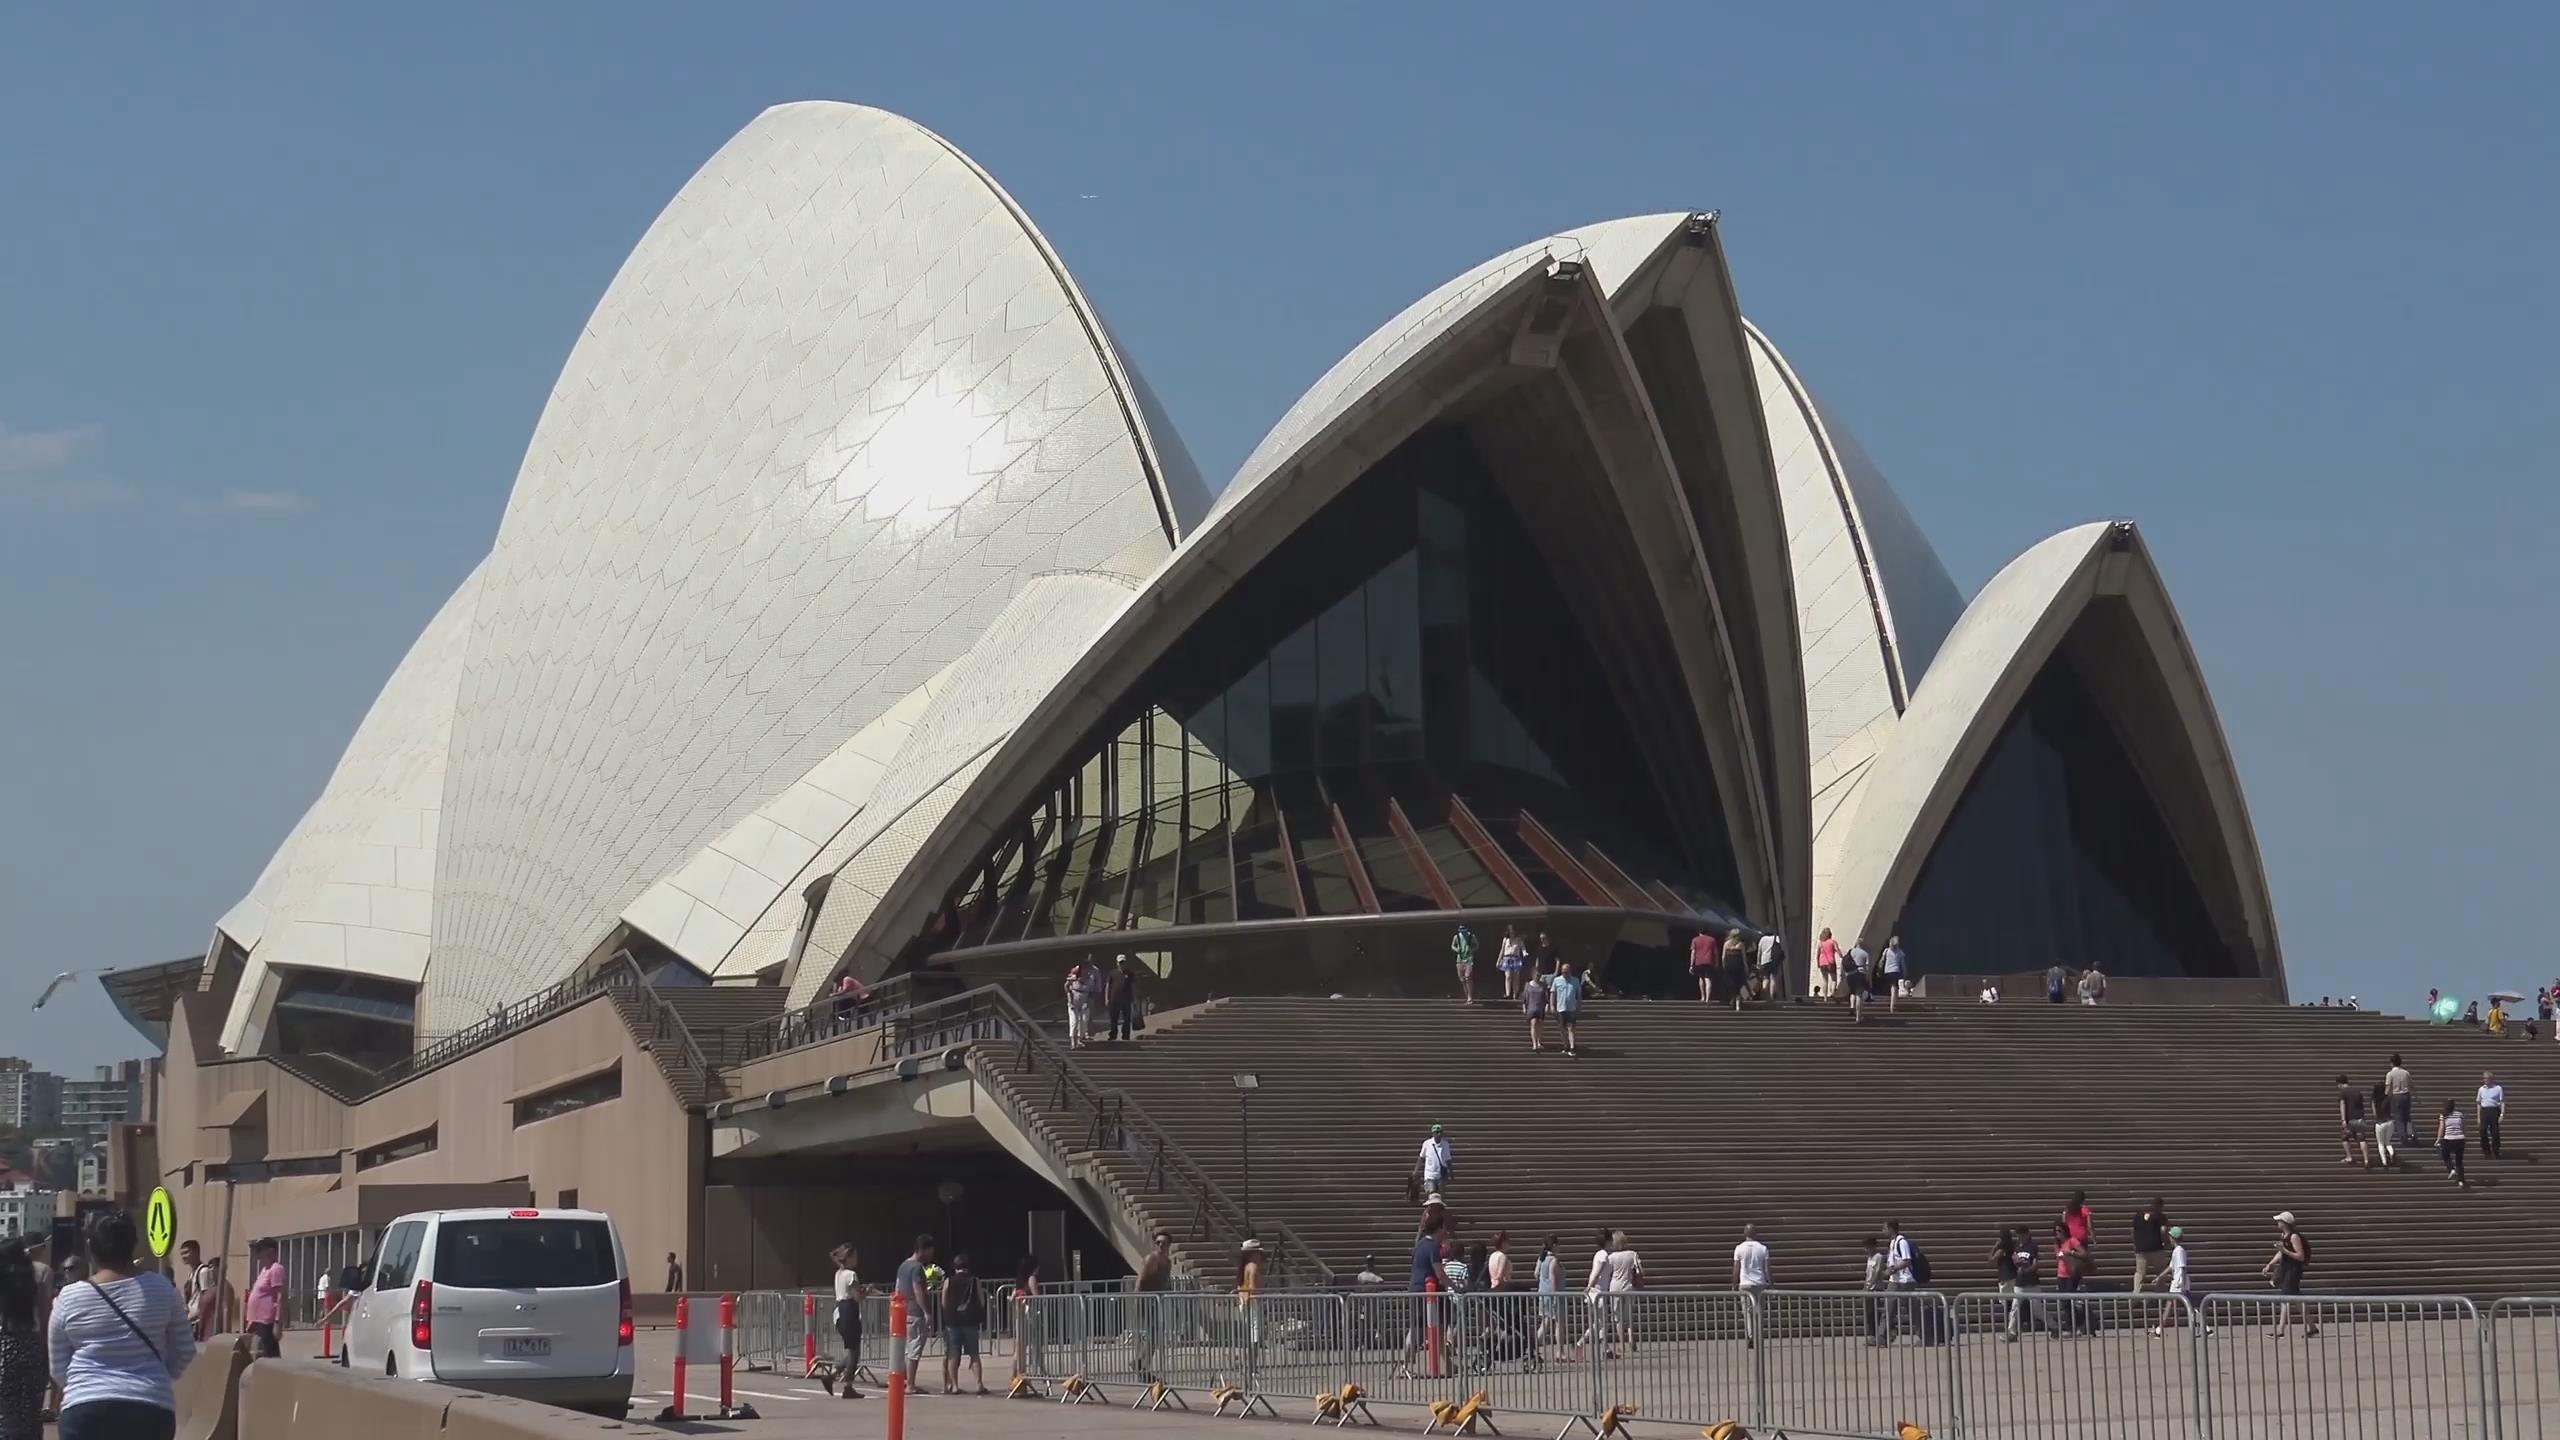 CS 60 澳大利亚悉尼大剧院